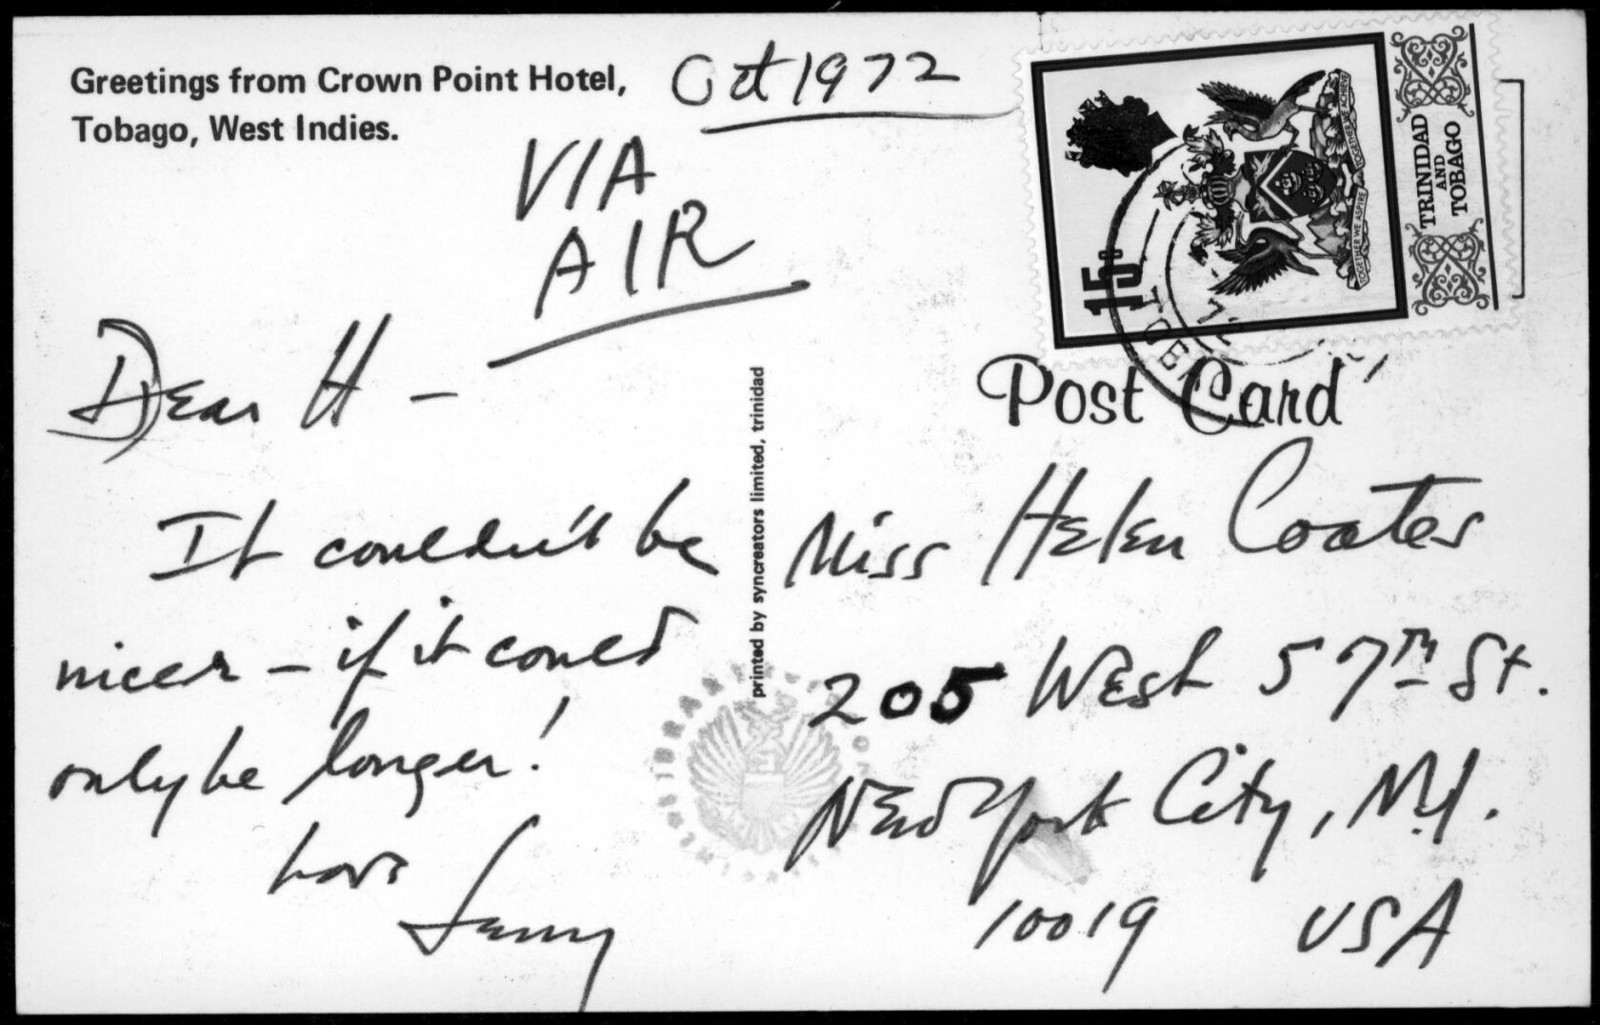 Letter from Leonard Bernstein to Helen Coates, October 1972